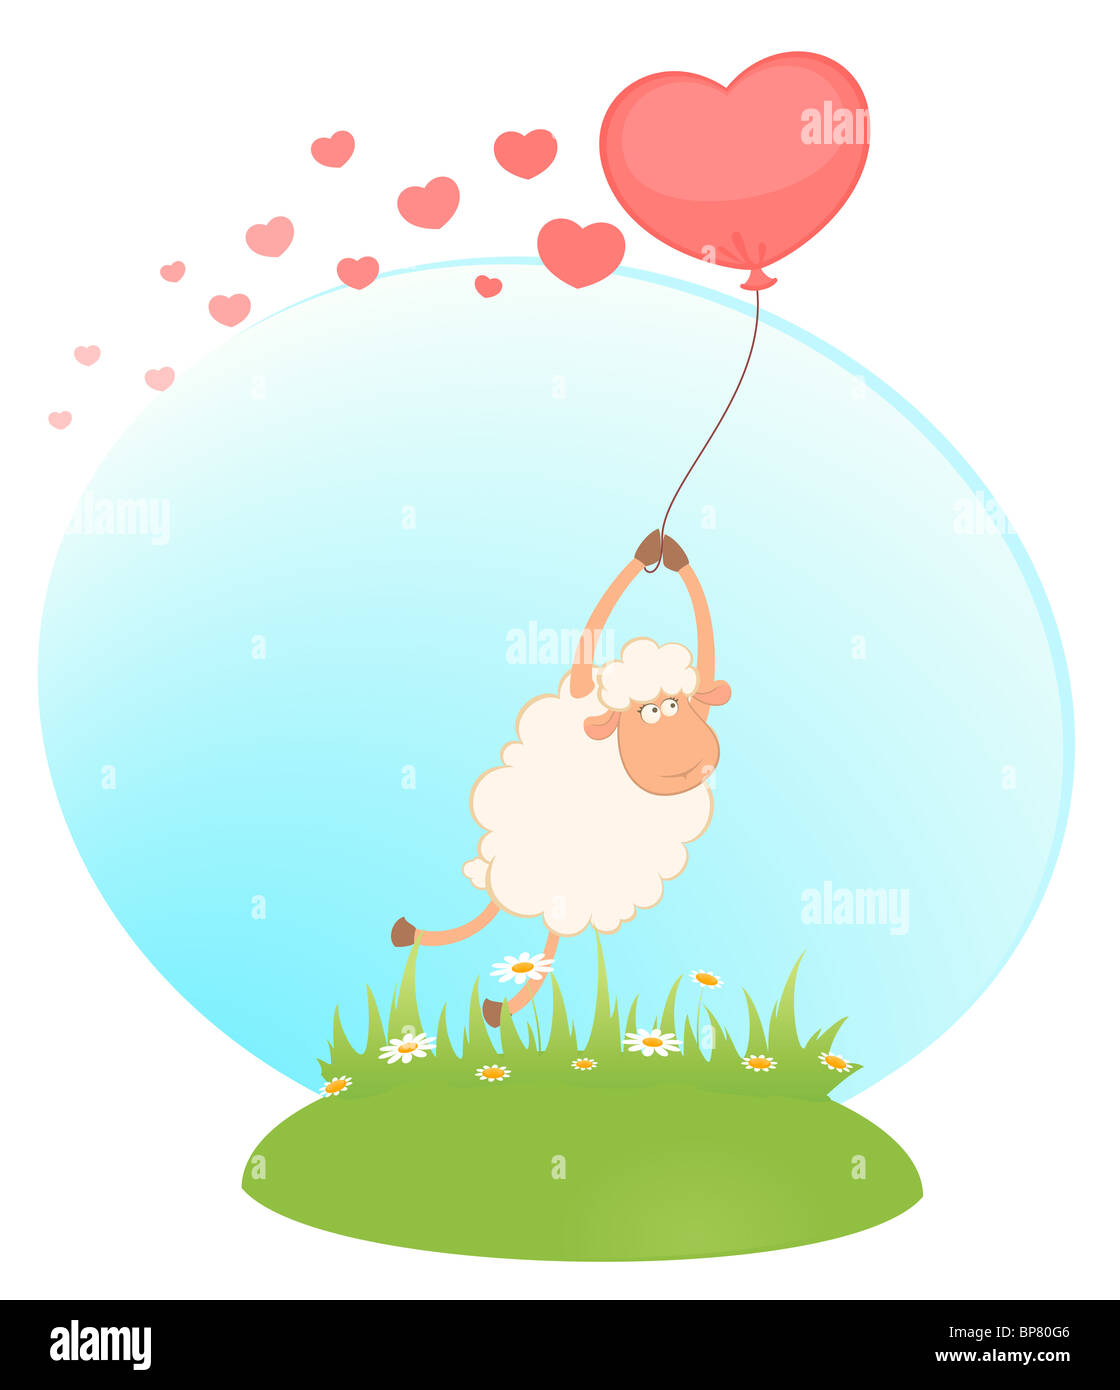 cartoon sheep flies on a balloon - Stock Image